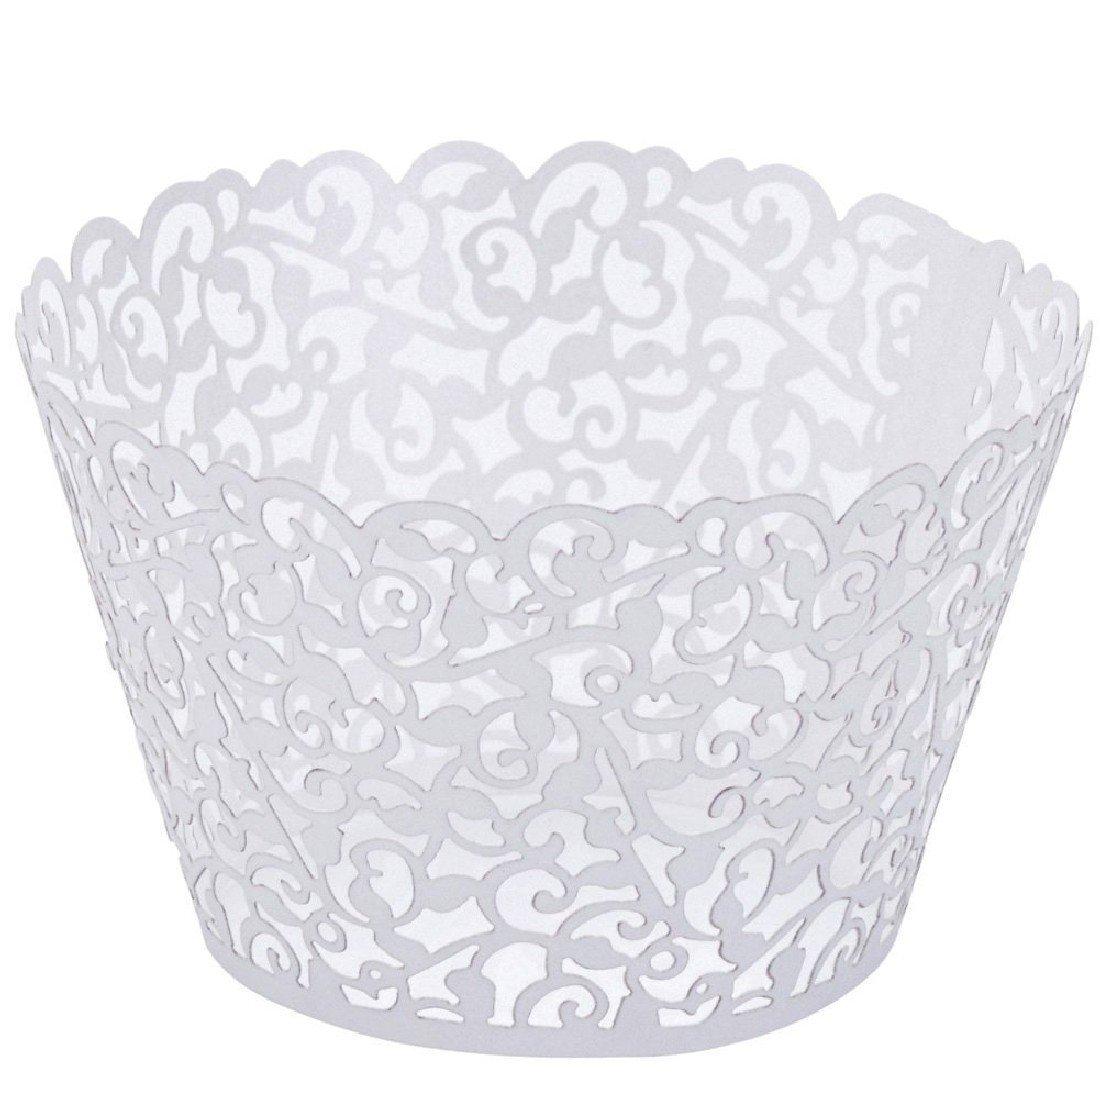 Switty 50Pearly Papier Vine Spitze Cup Cake Wrappers Cupcake Tower Kuchen Dekoration Supplies Weiß